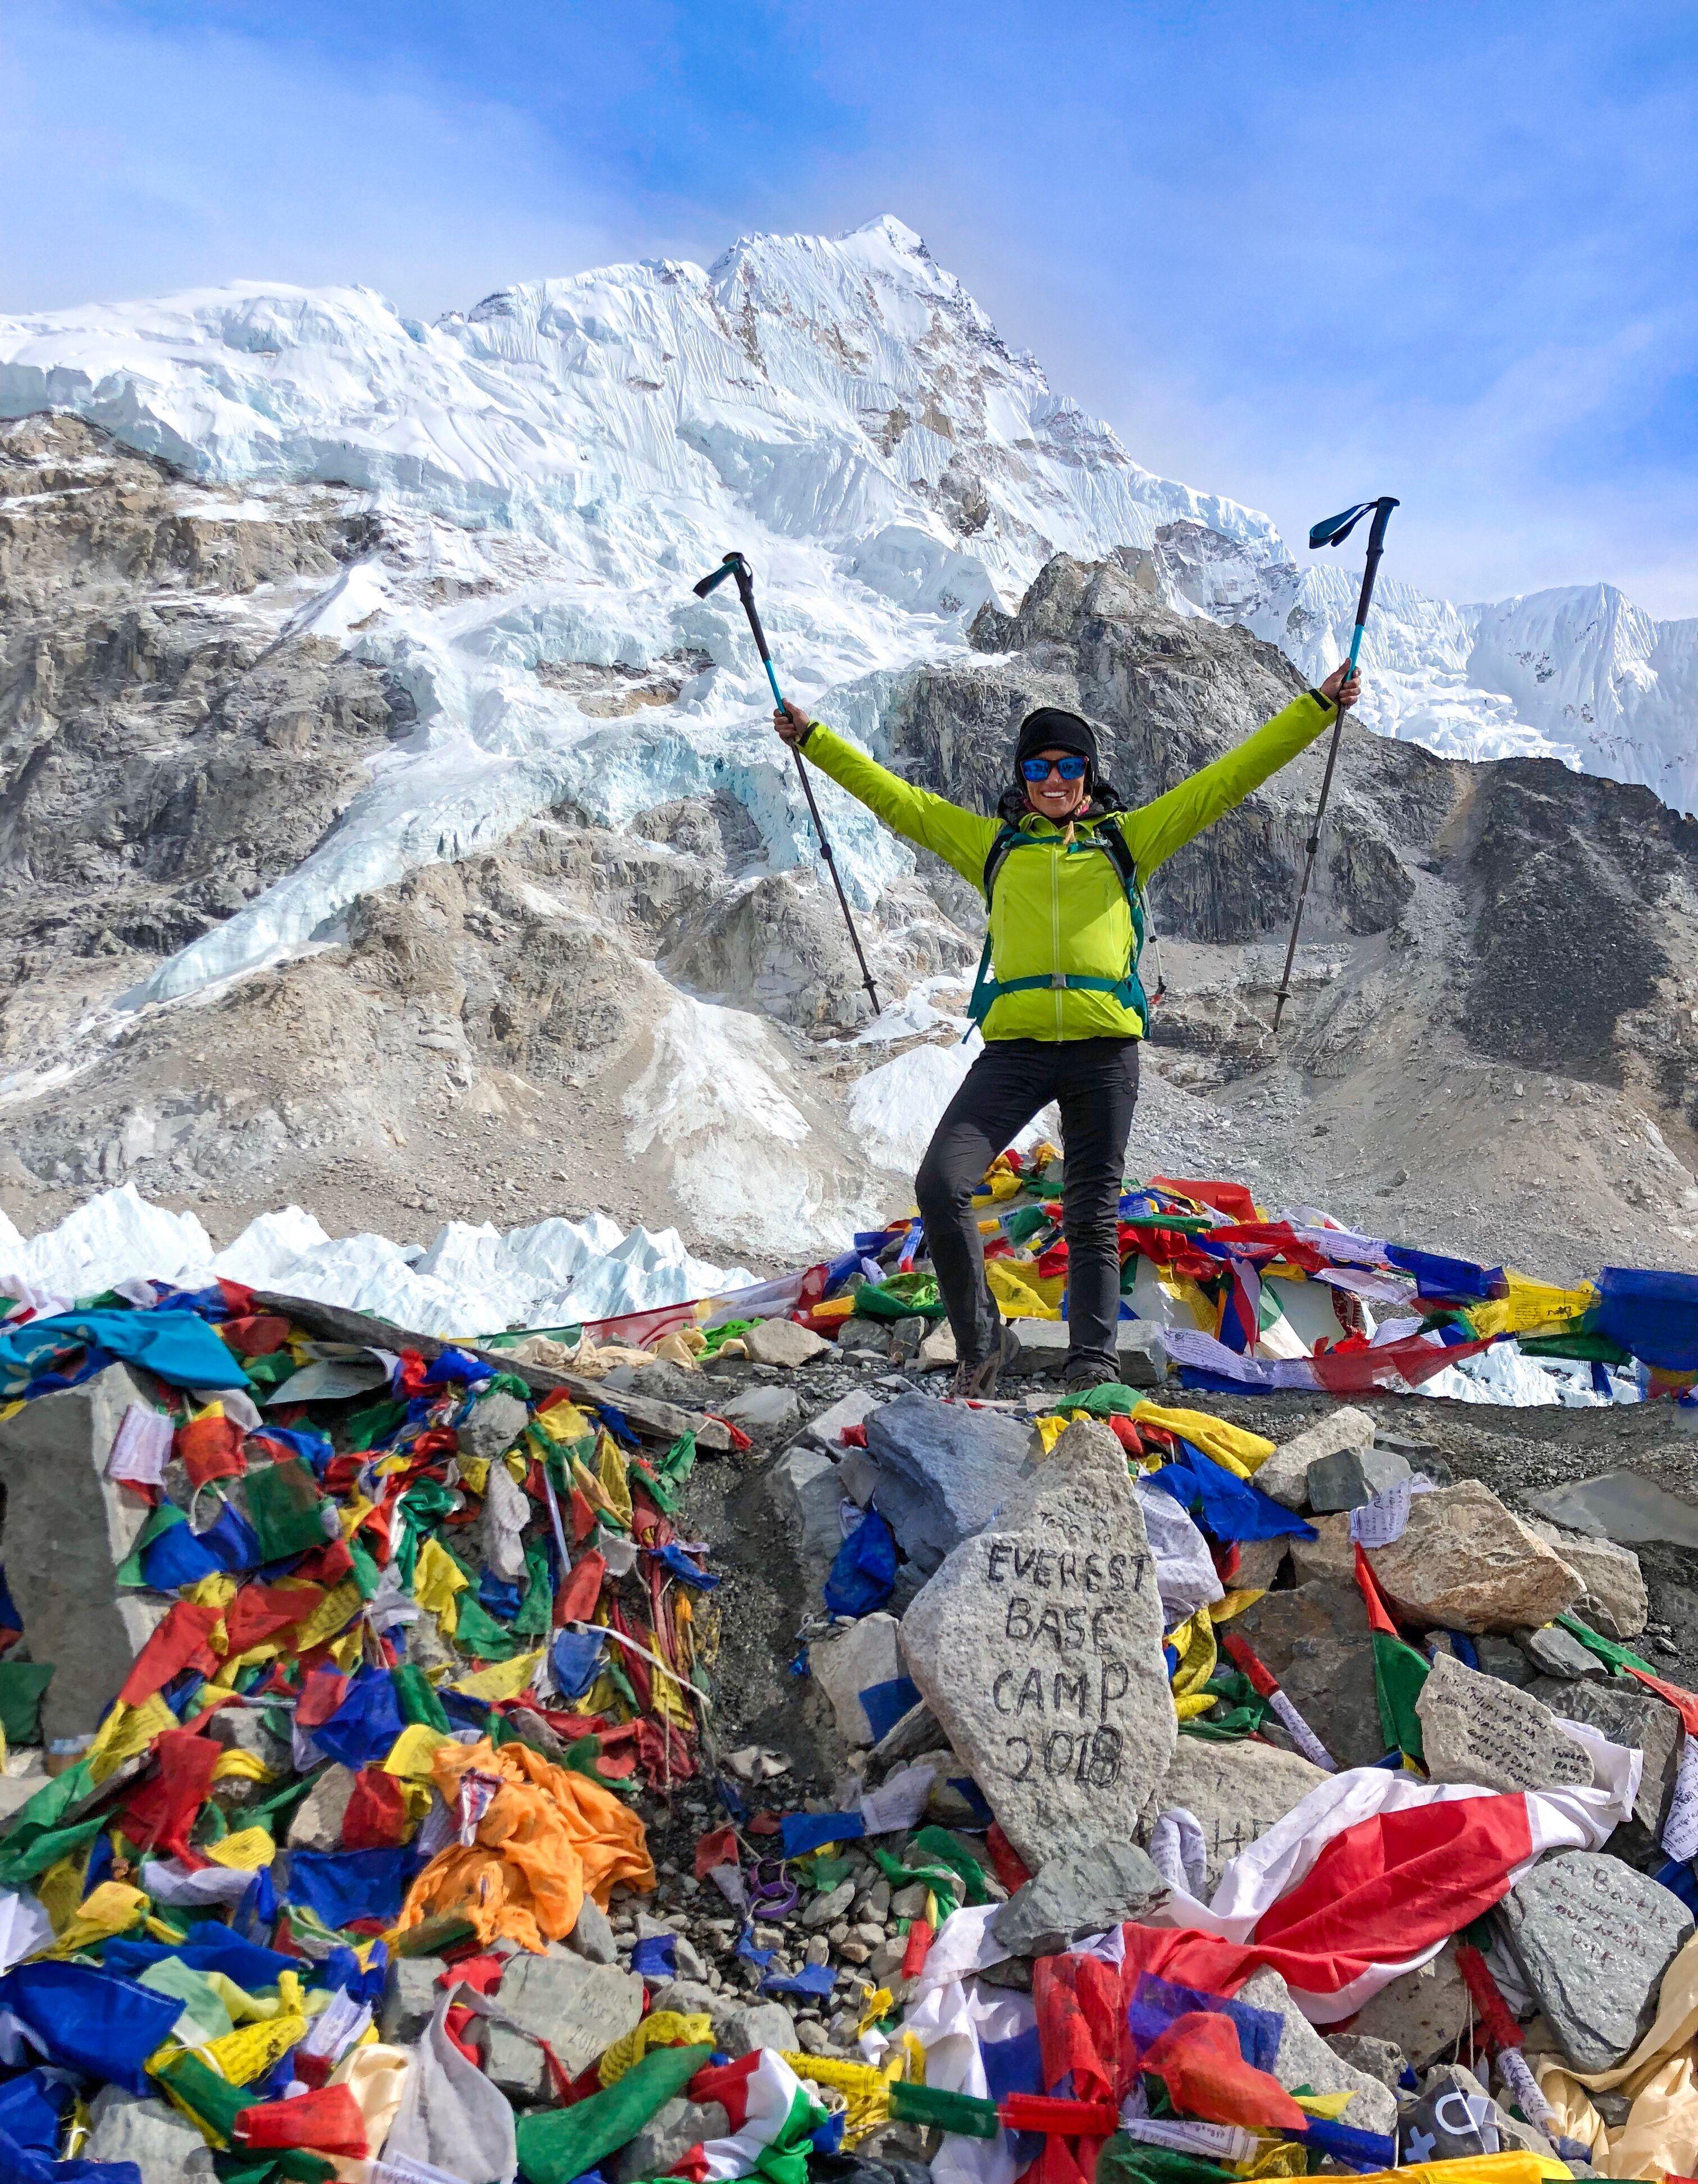 Kit list for Everest Base Camp